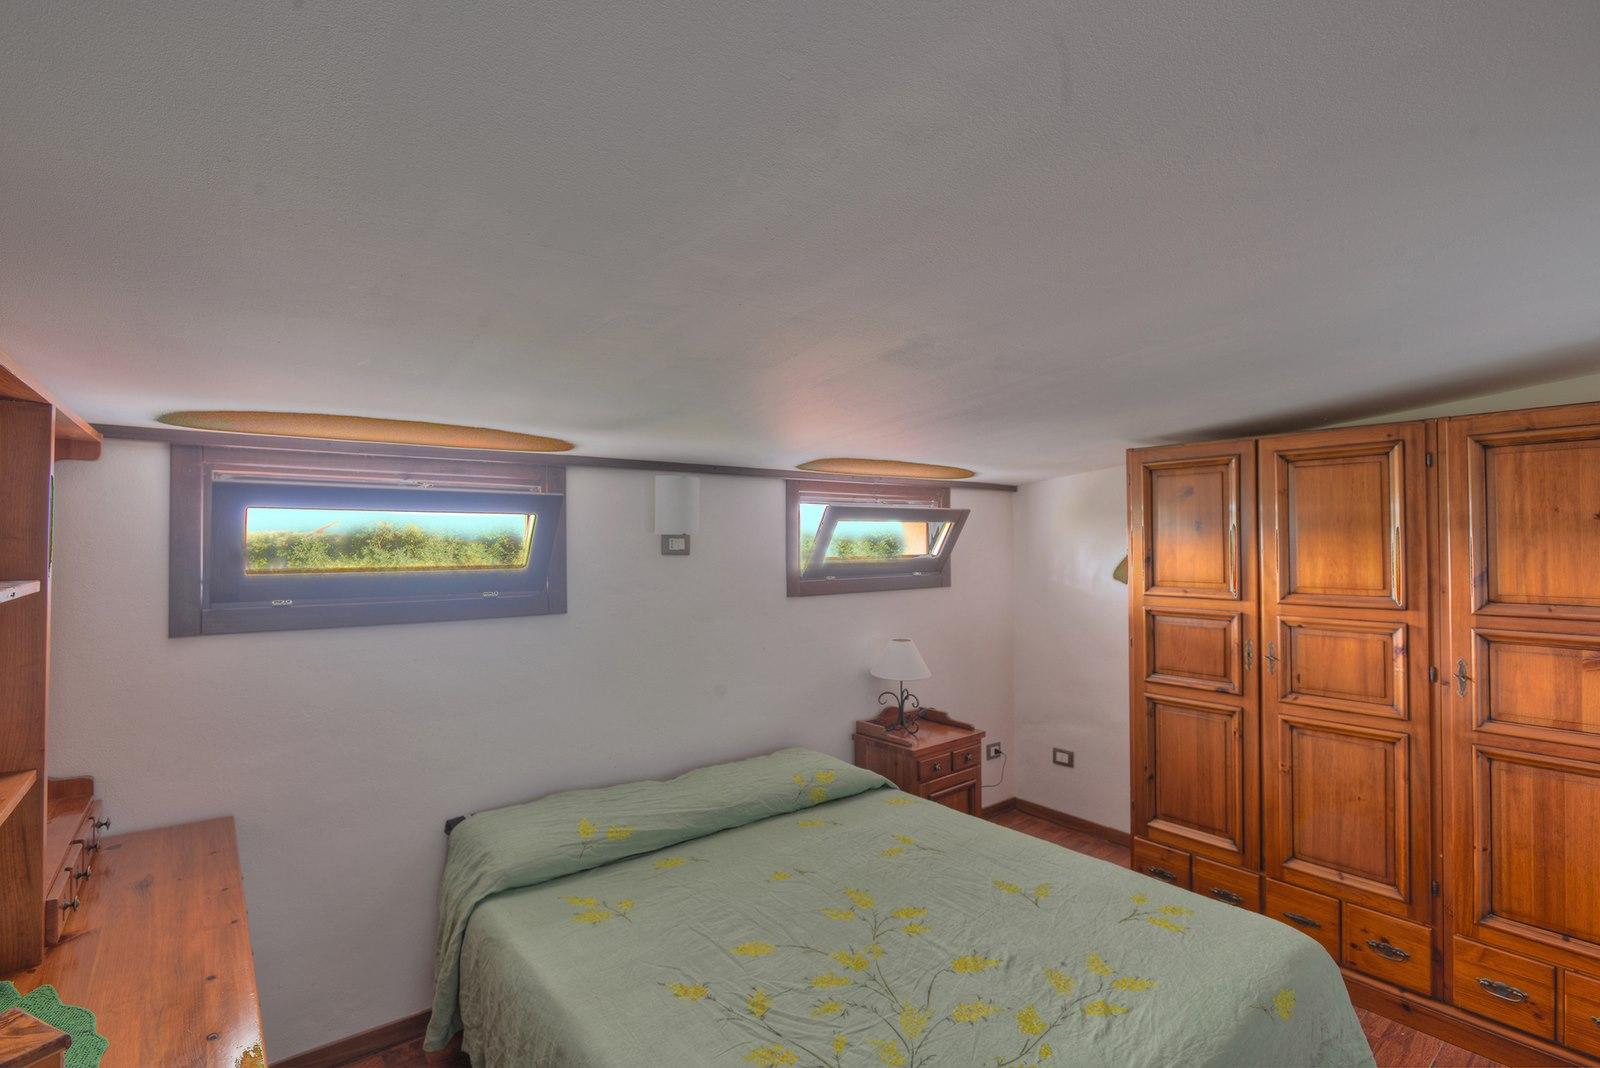 Maison de vacances Villa Casa (1531407), Solarino, Siracusa, Sicile, Italie, image 9